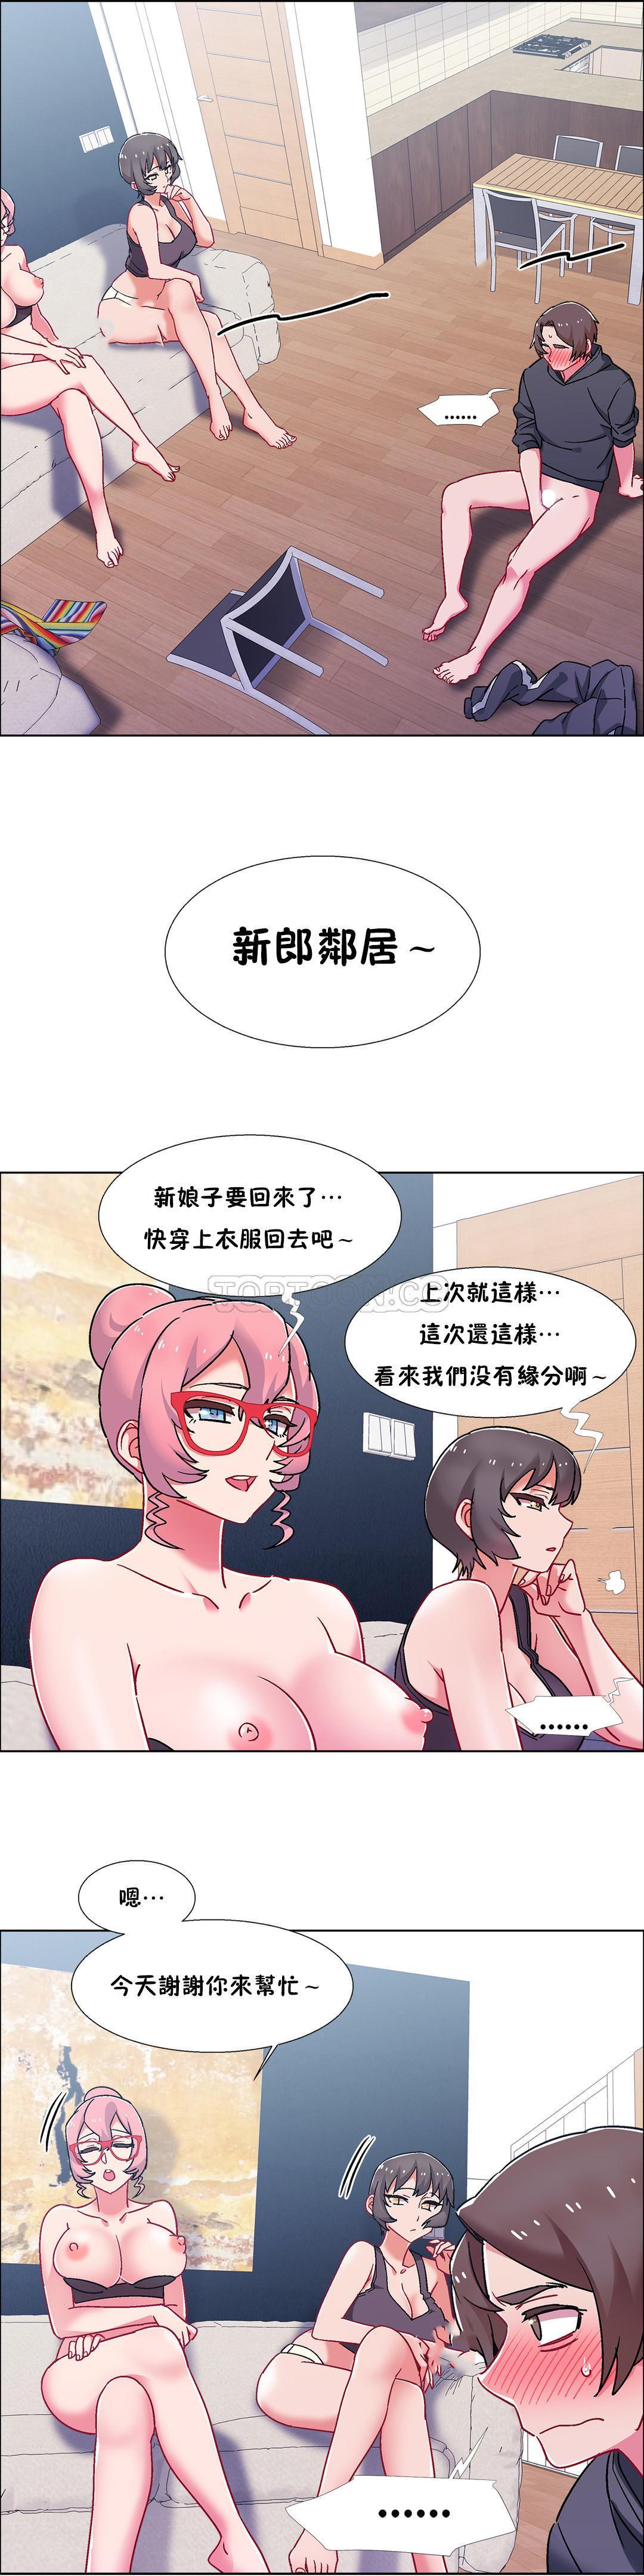 [Studio Wannabe] Rental Girls | 出租女郎 Ch. 33-58 [Chinese]  第二季 完结 391